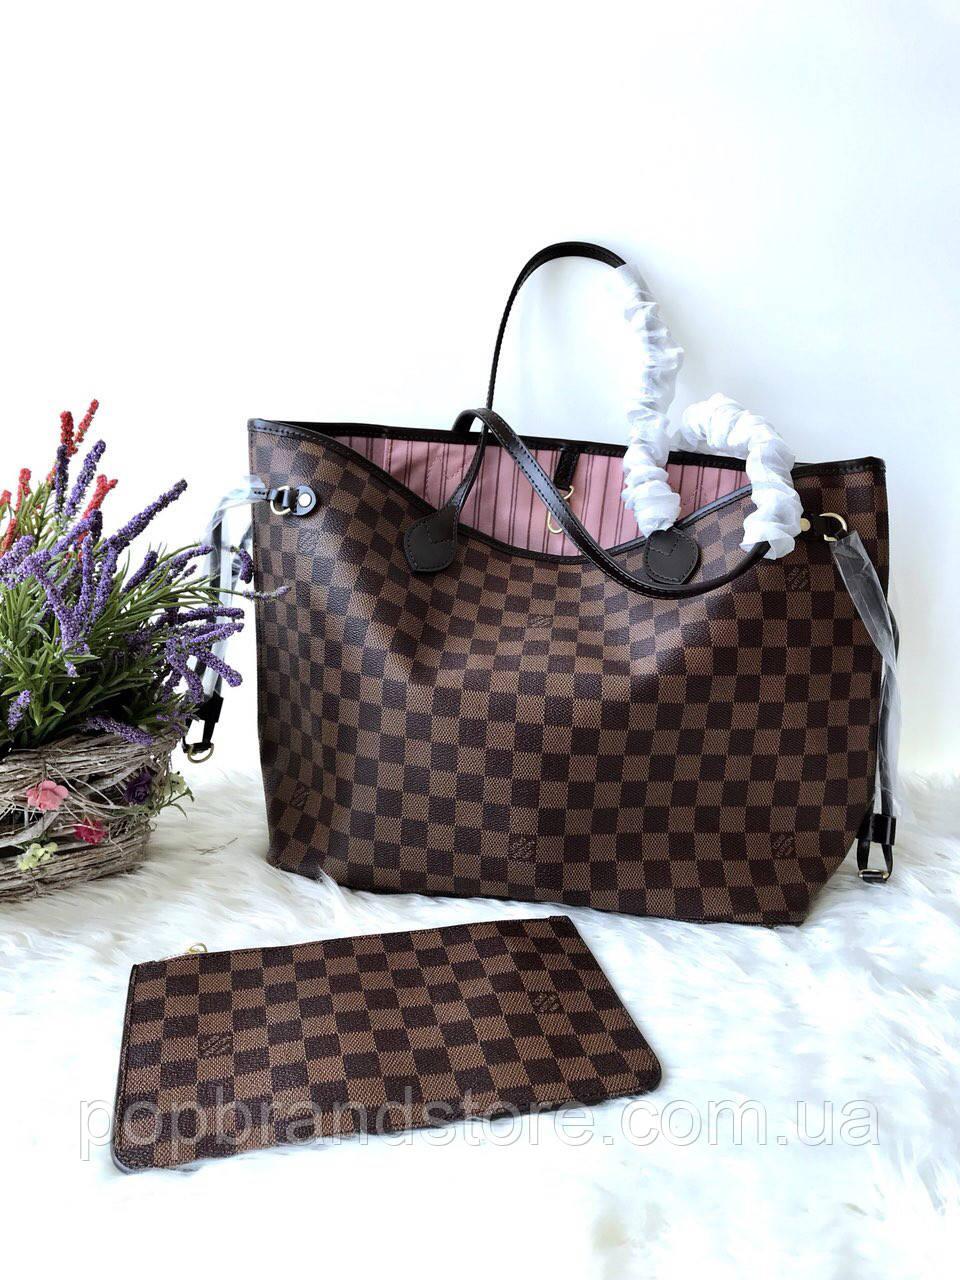 914c1262b77f Популярная сумка Louis Vuitton Neverfull 32 cм натуральная кожа (реплика)